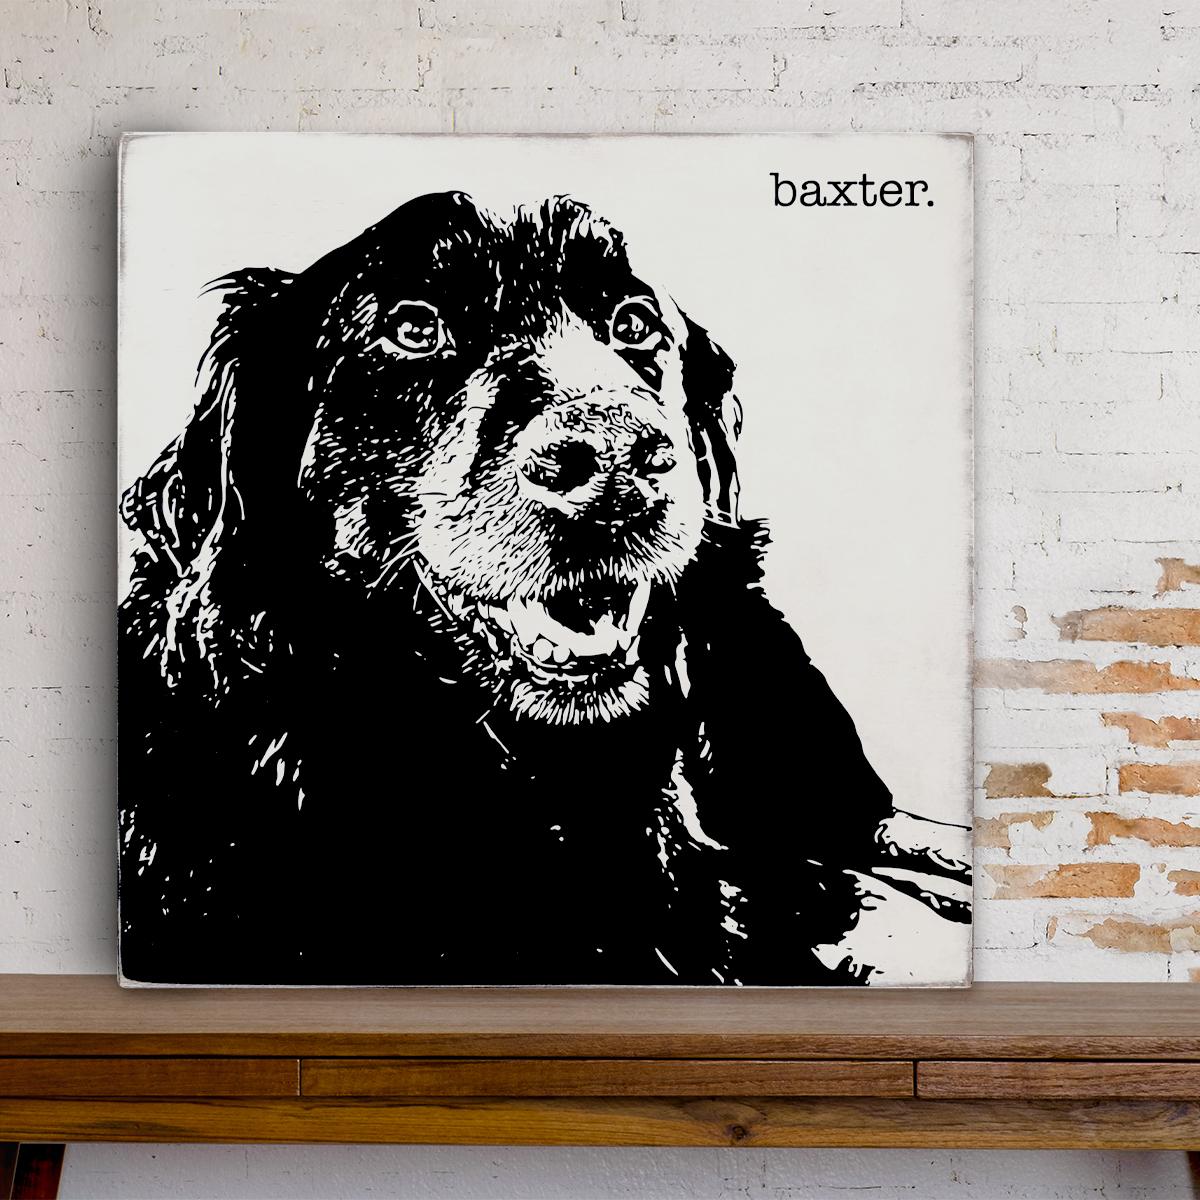 BaxterPortrait.jpg